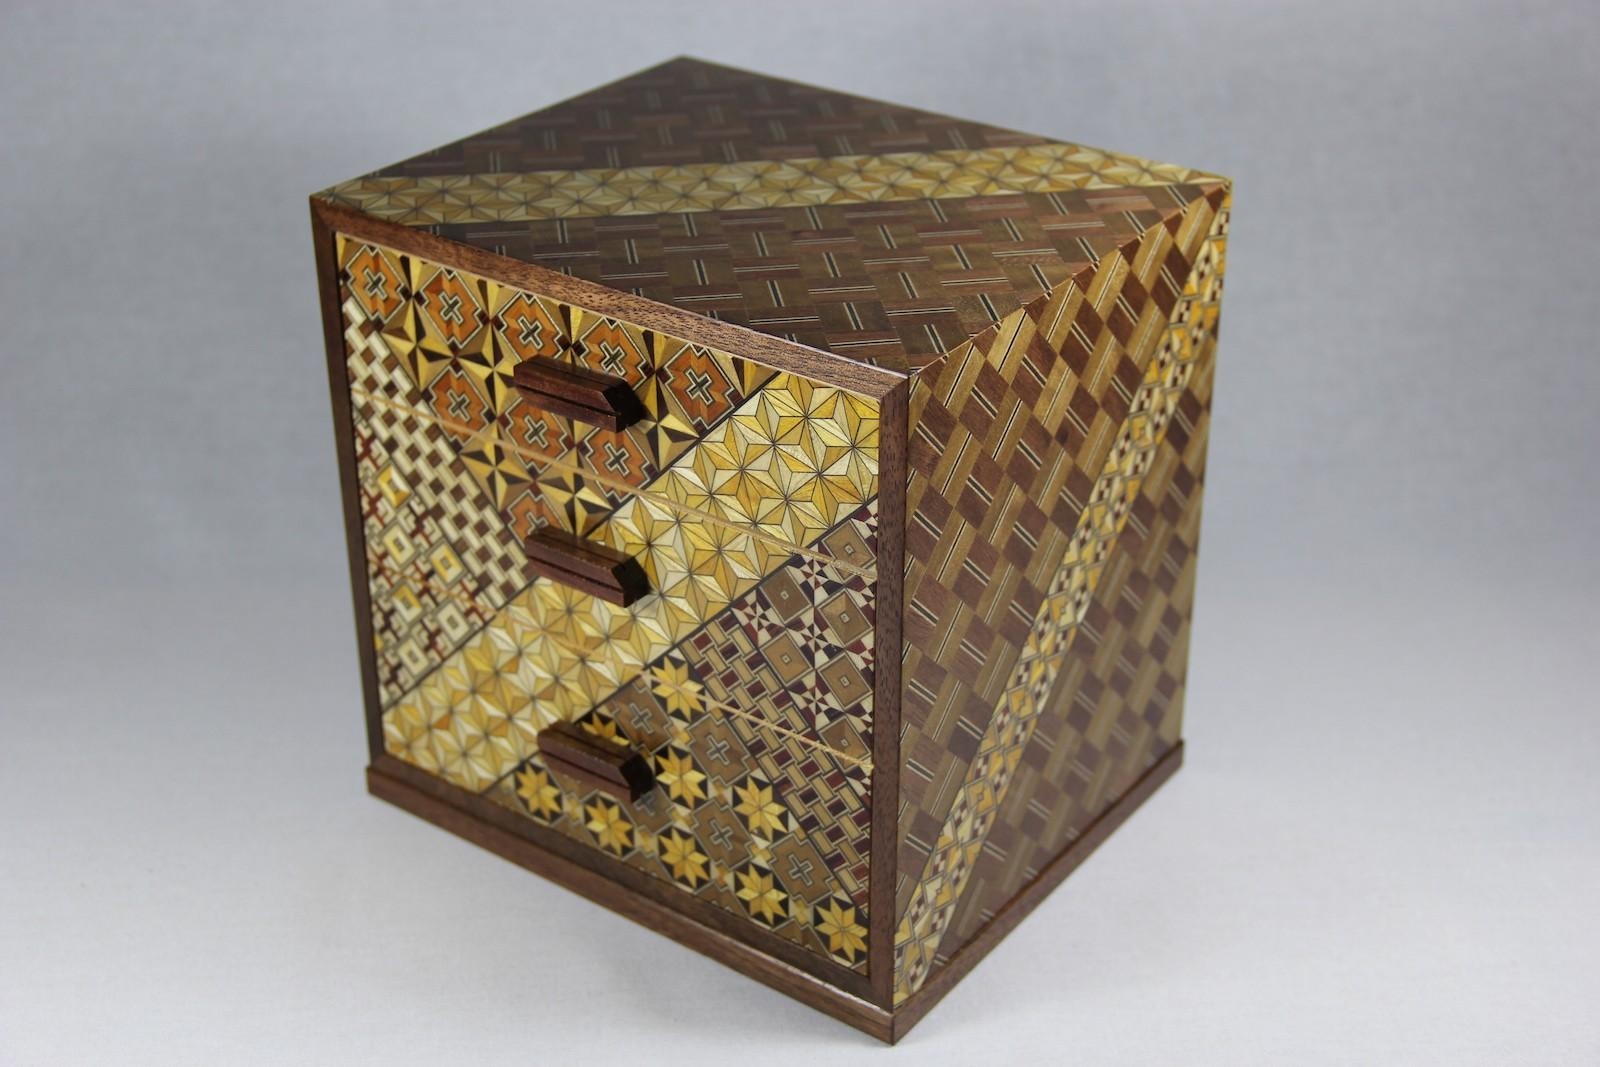 6 SUN 3 DRAWERS BOX KOYOSEGI